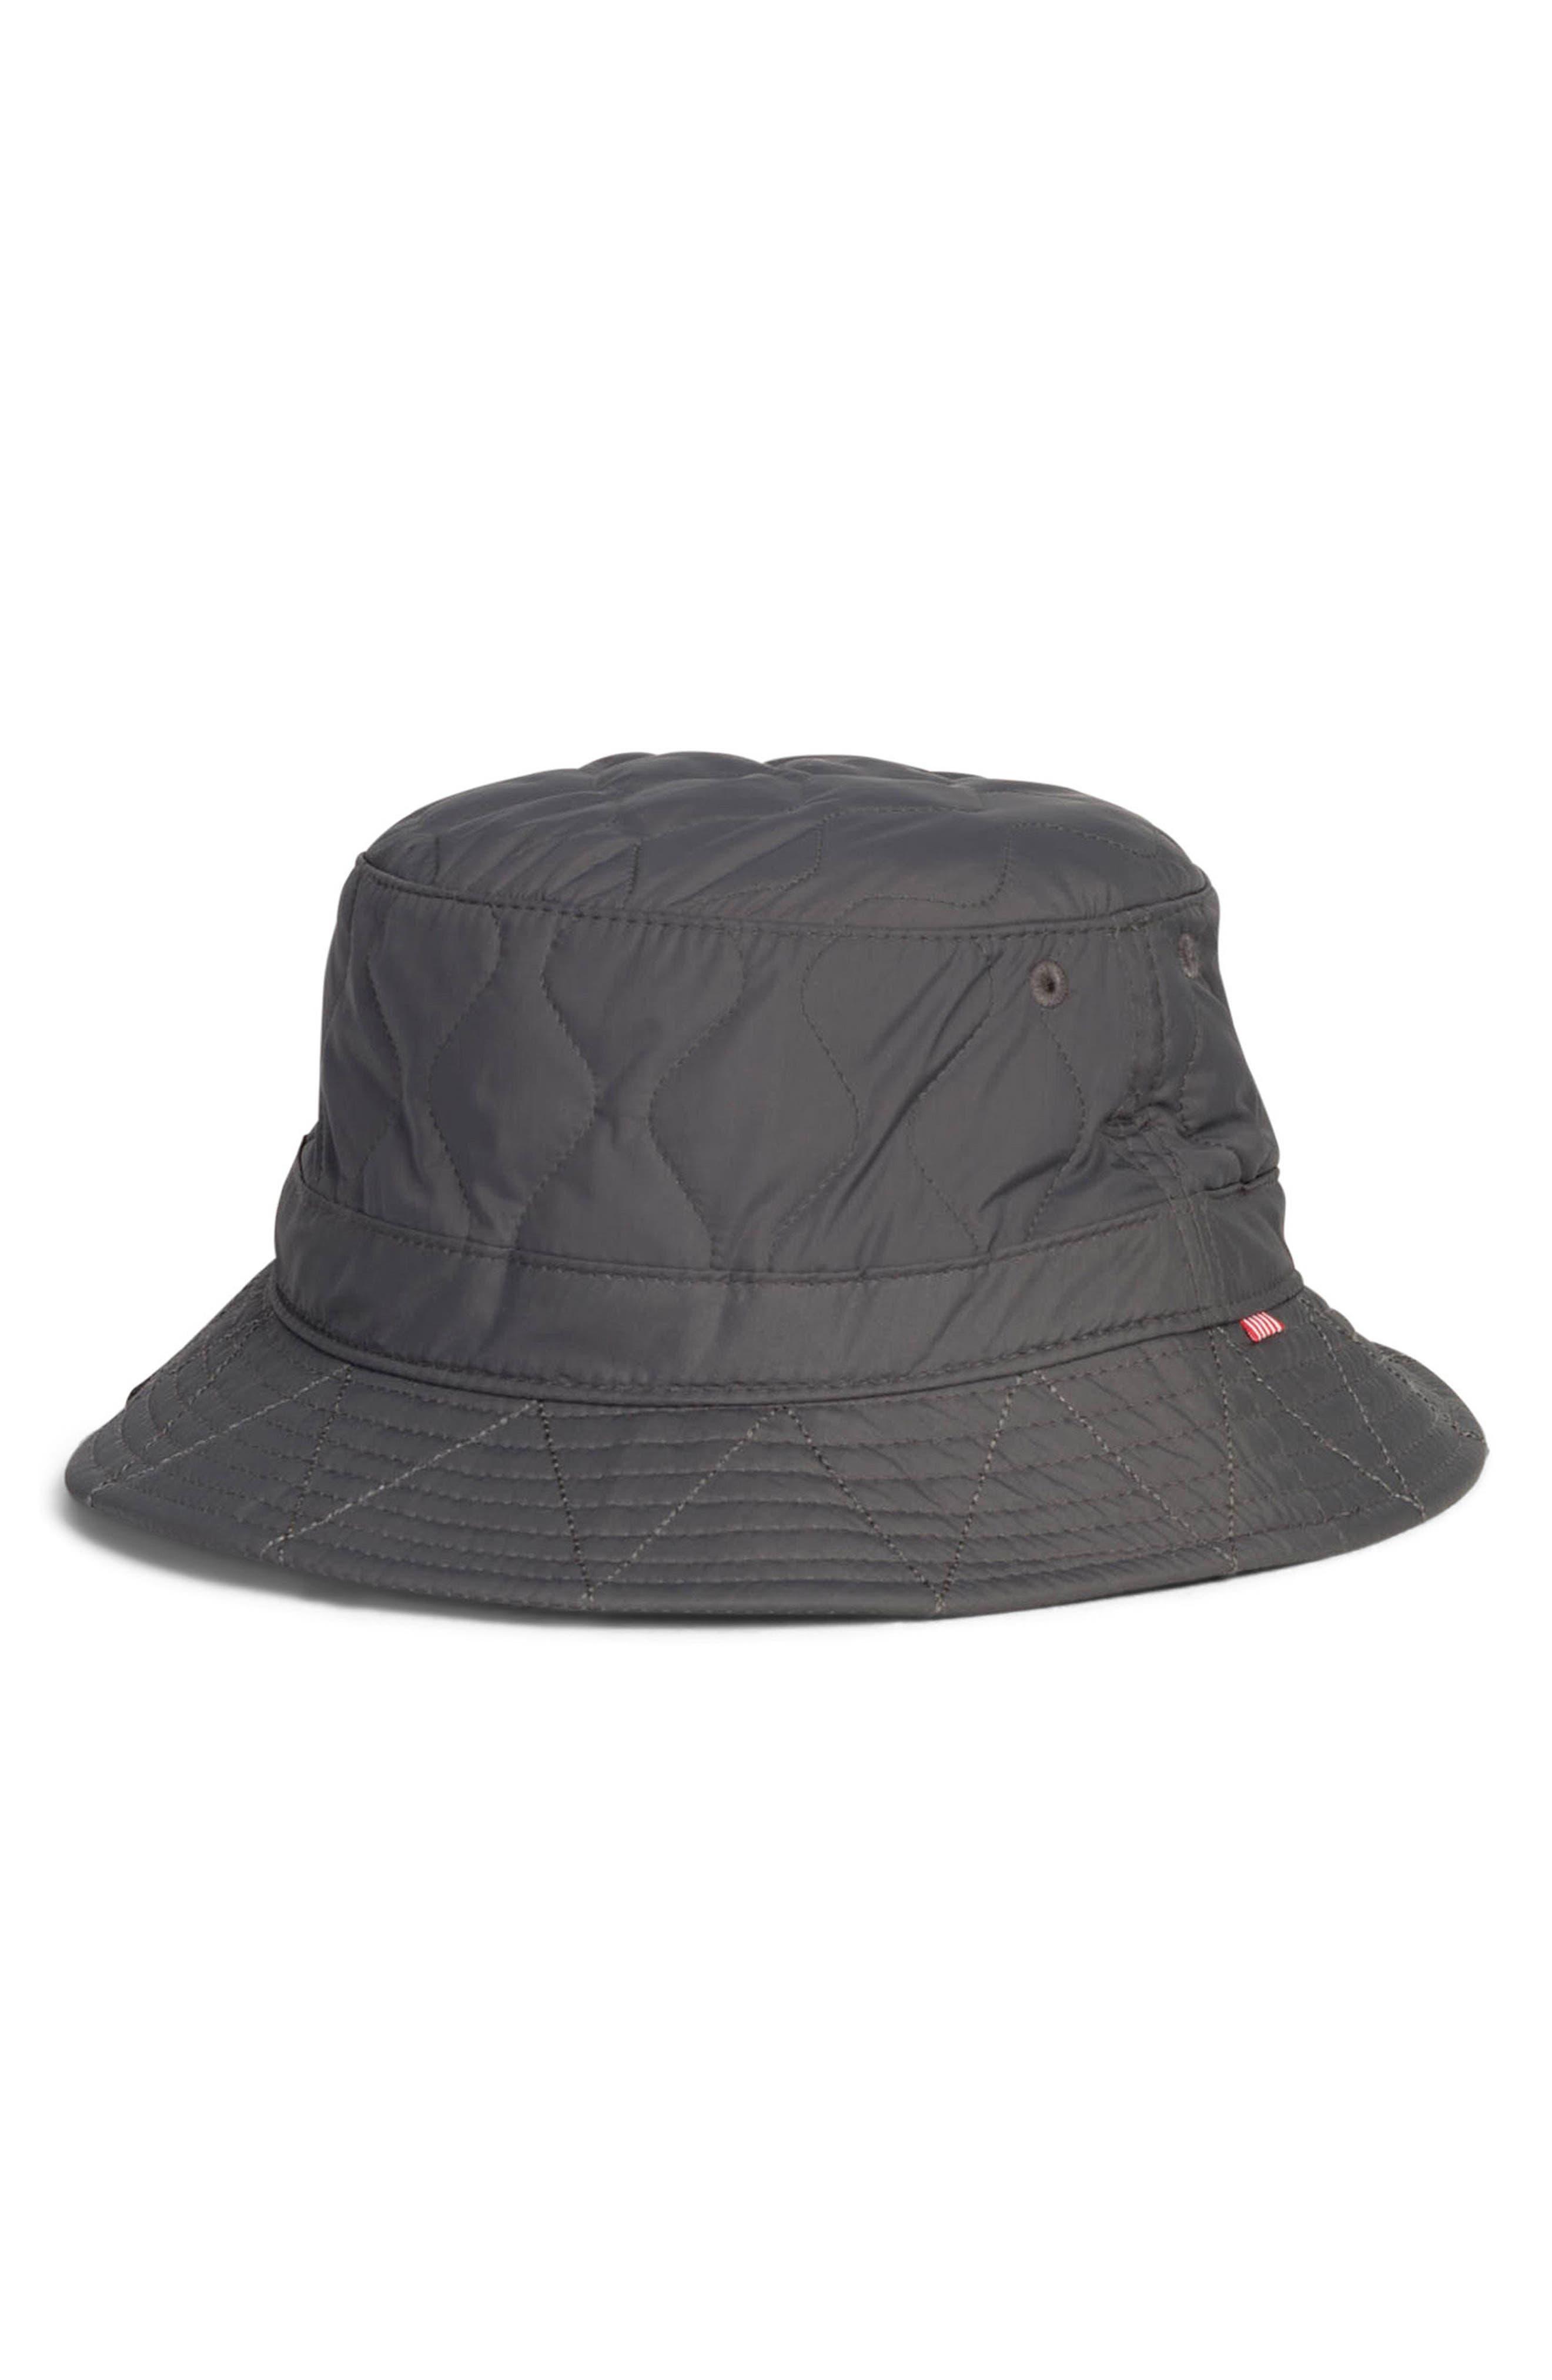 Lake Bucket Hat,                             Main thumbnail 1, color,